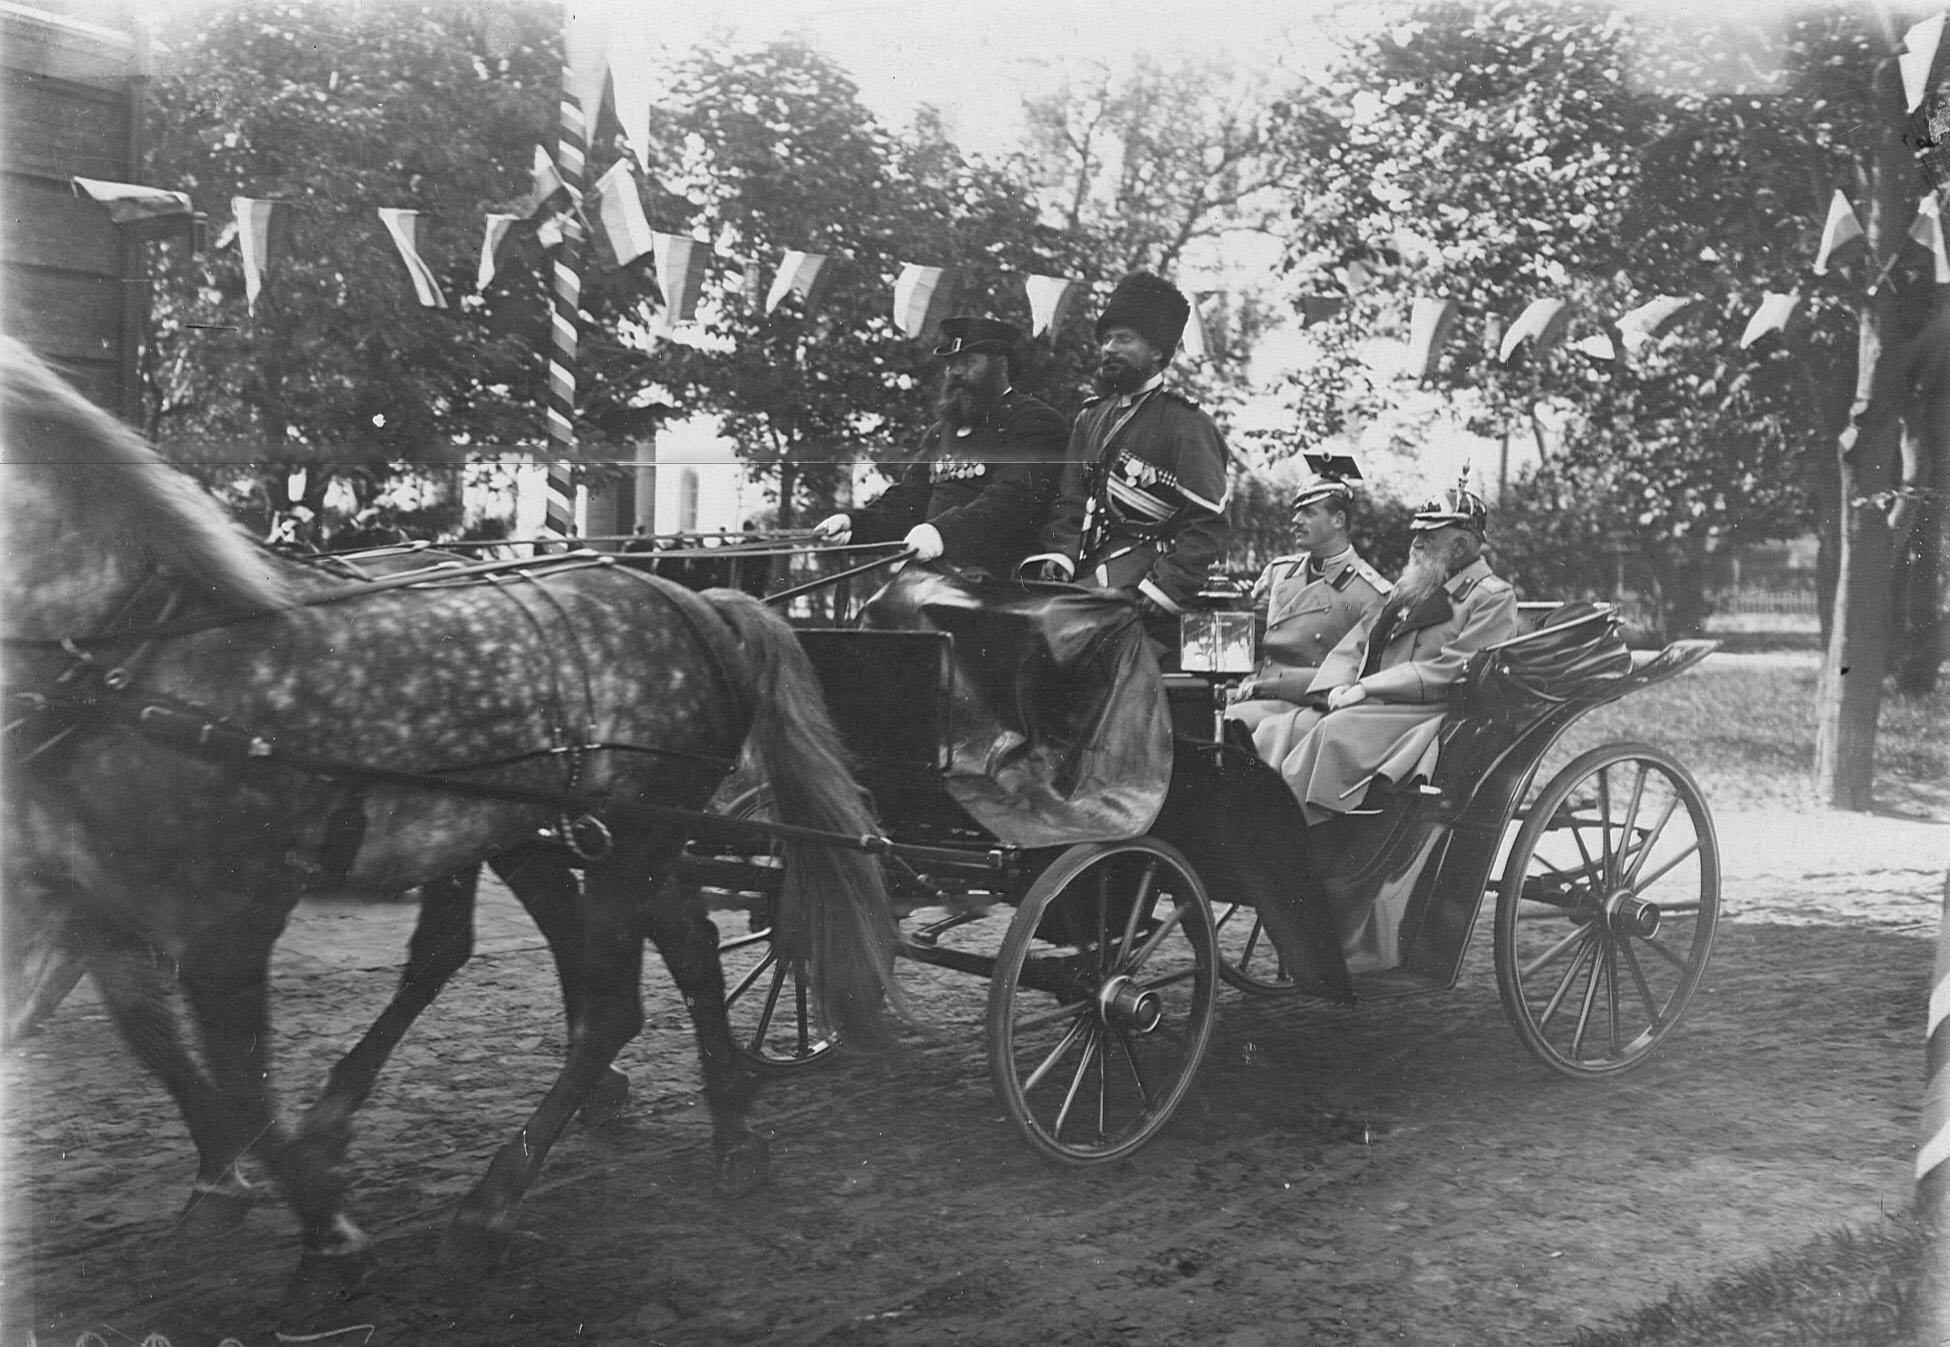 Прибытие великого князя Михаила Александровича (слева) на празднование 250-летнего юбилея полка